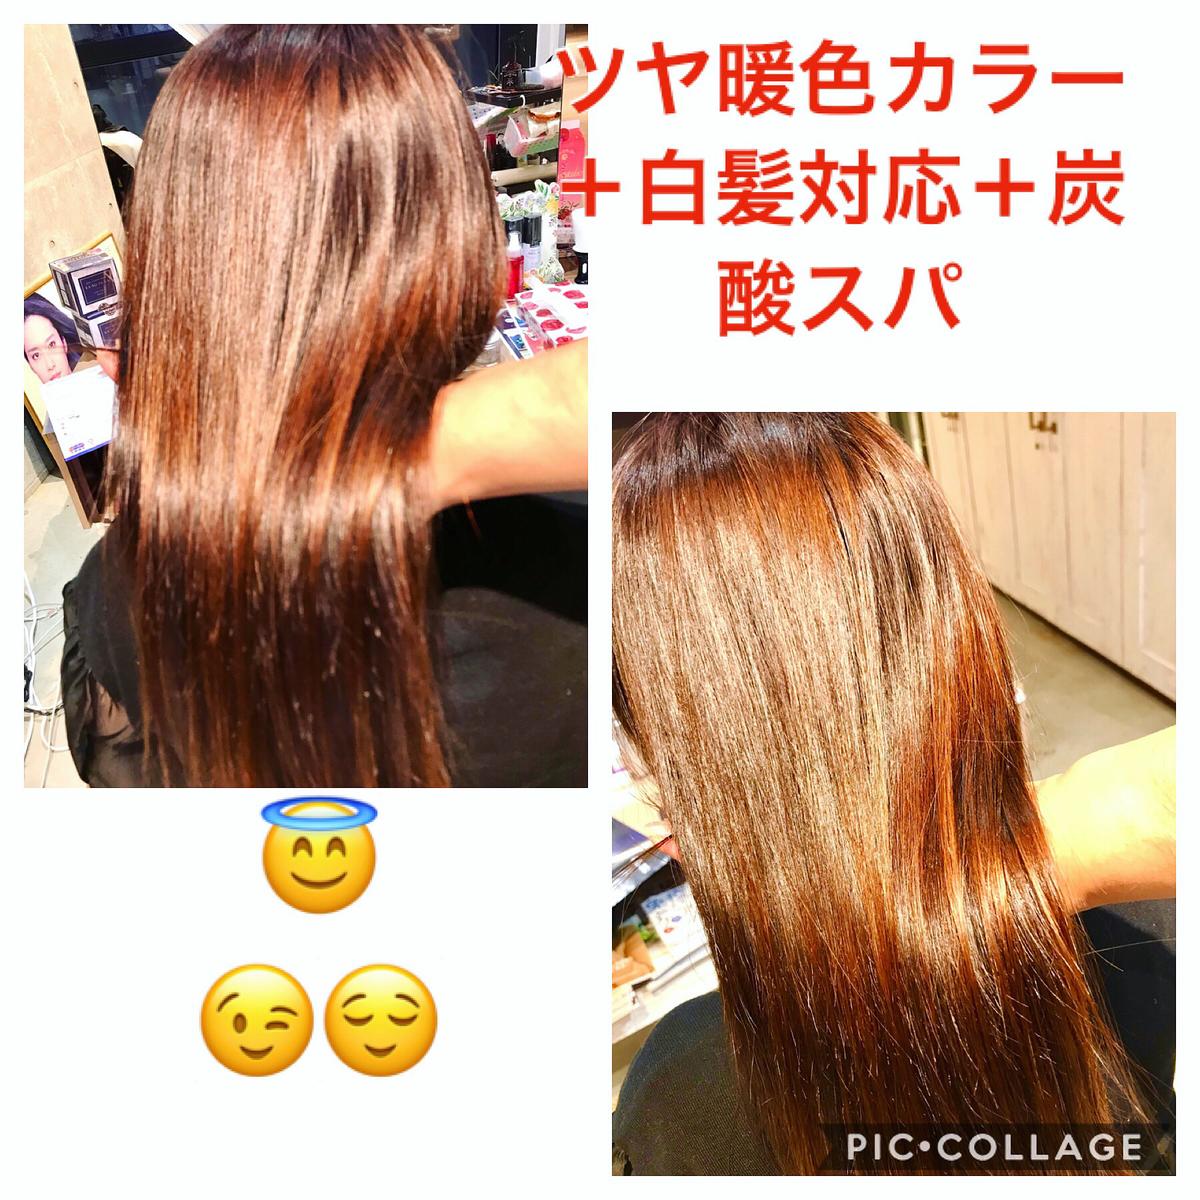 f:id:admiralyoshio:20201125002338j:plain